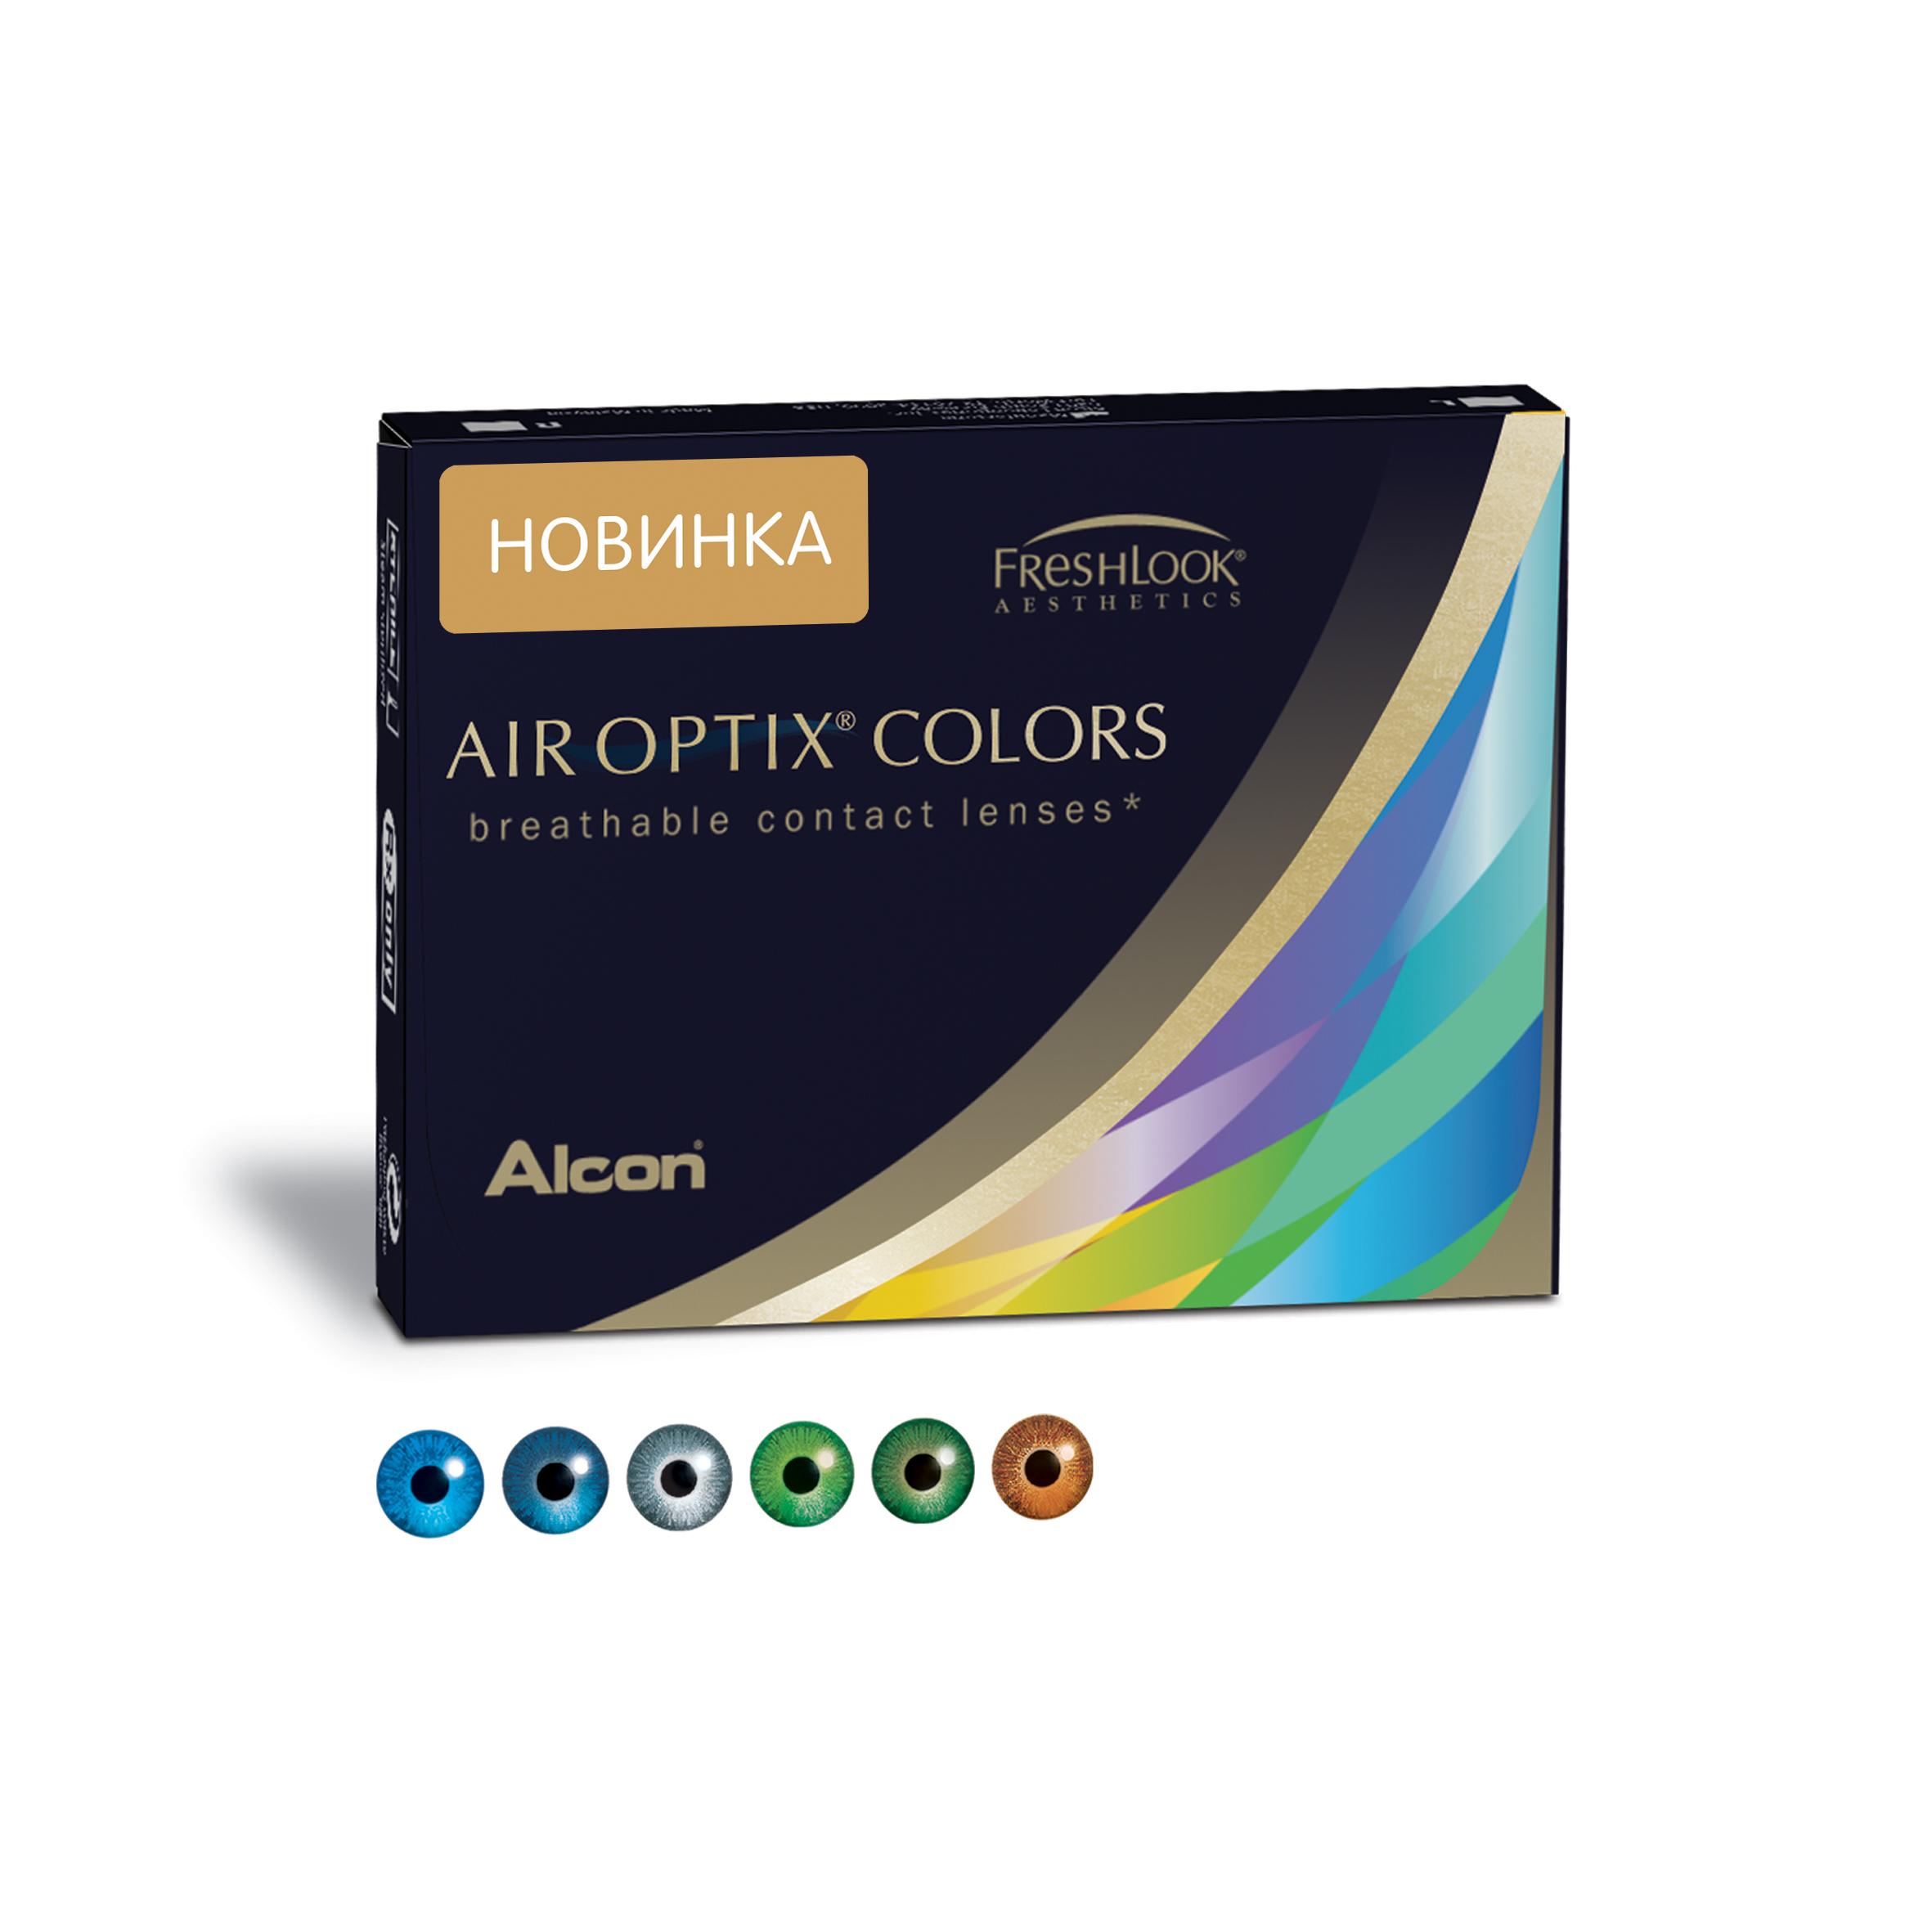 Аlcon контактные линзы Air Optix Colors 2 шт -5.00 Sterling Gray31746273Мягкие контактные линзы